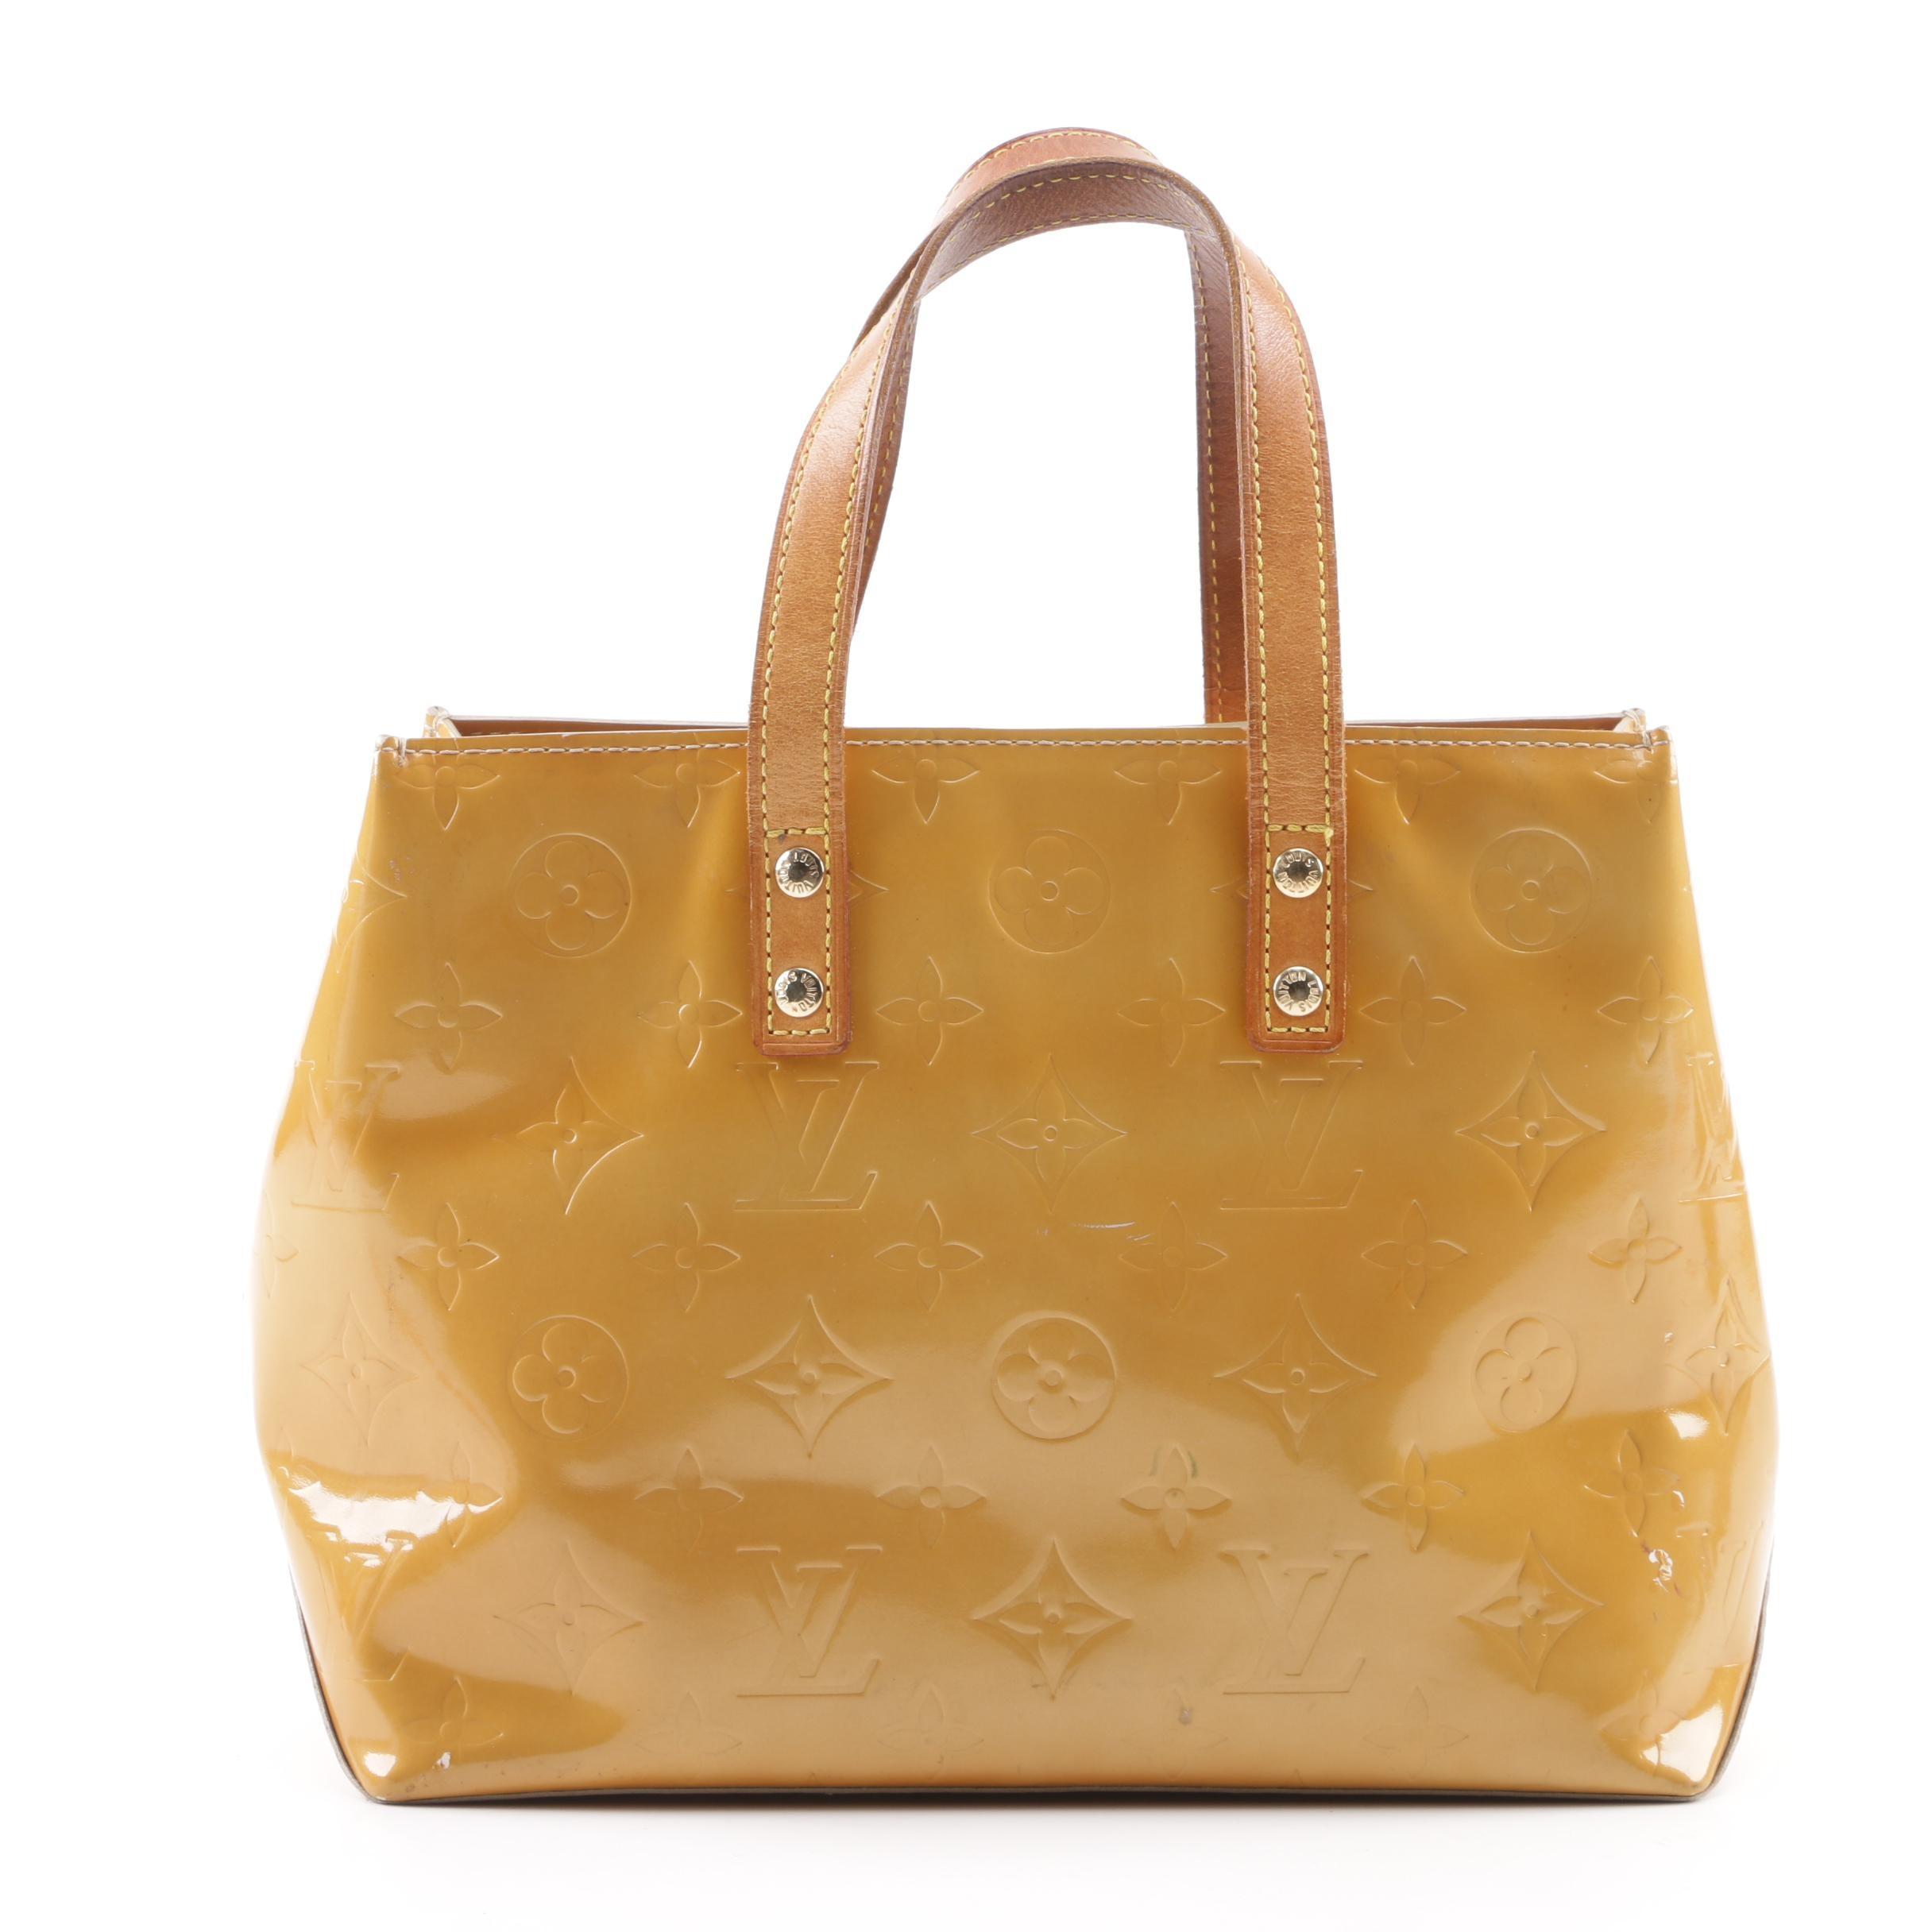 2001 Louis Vuitton Reade PM Mango Vernis Leather Tote Handbag